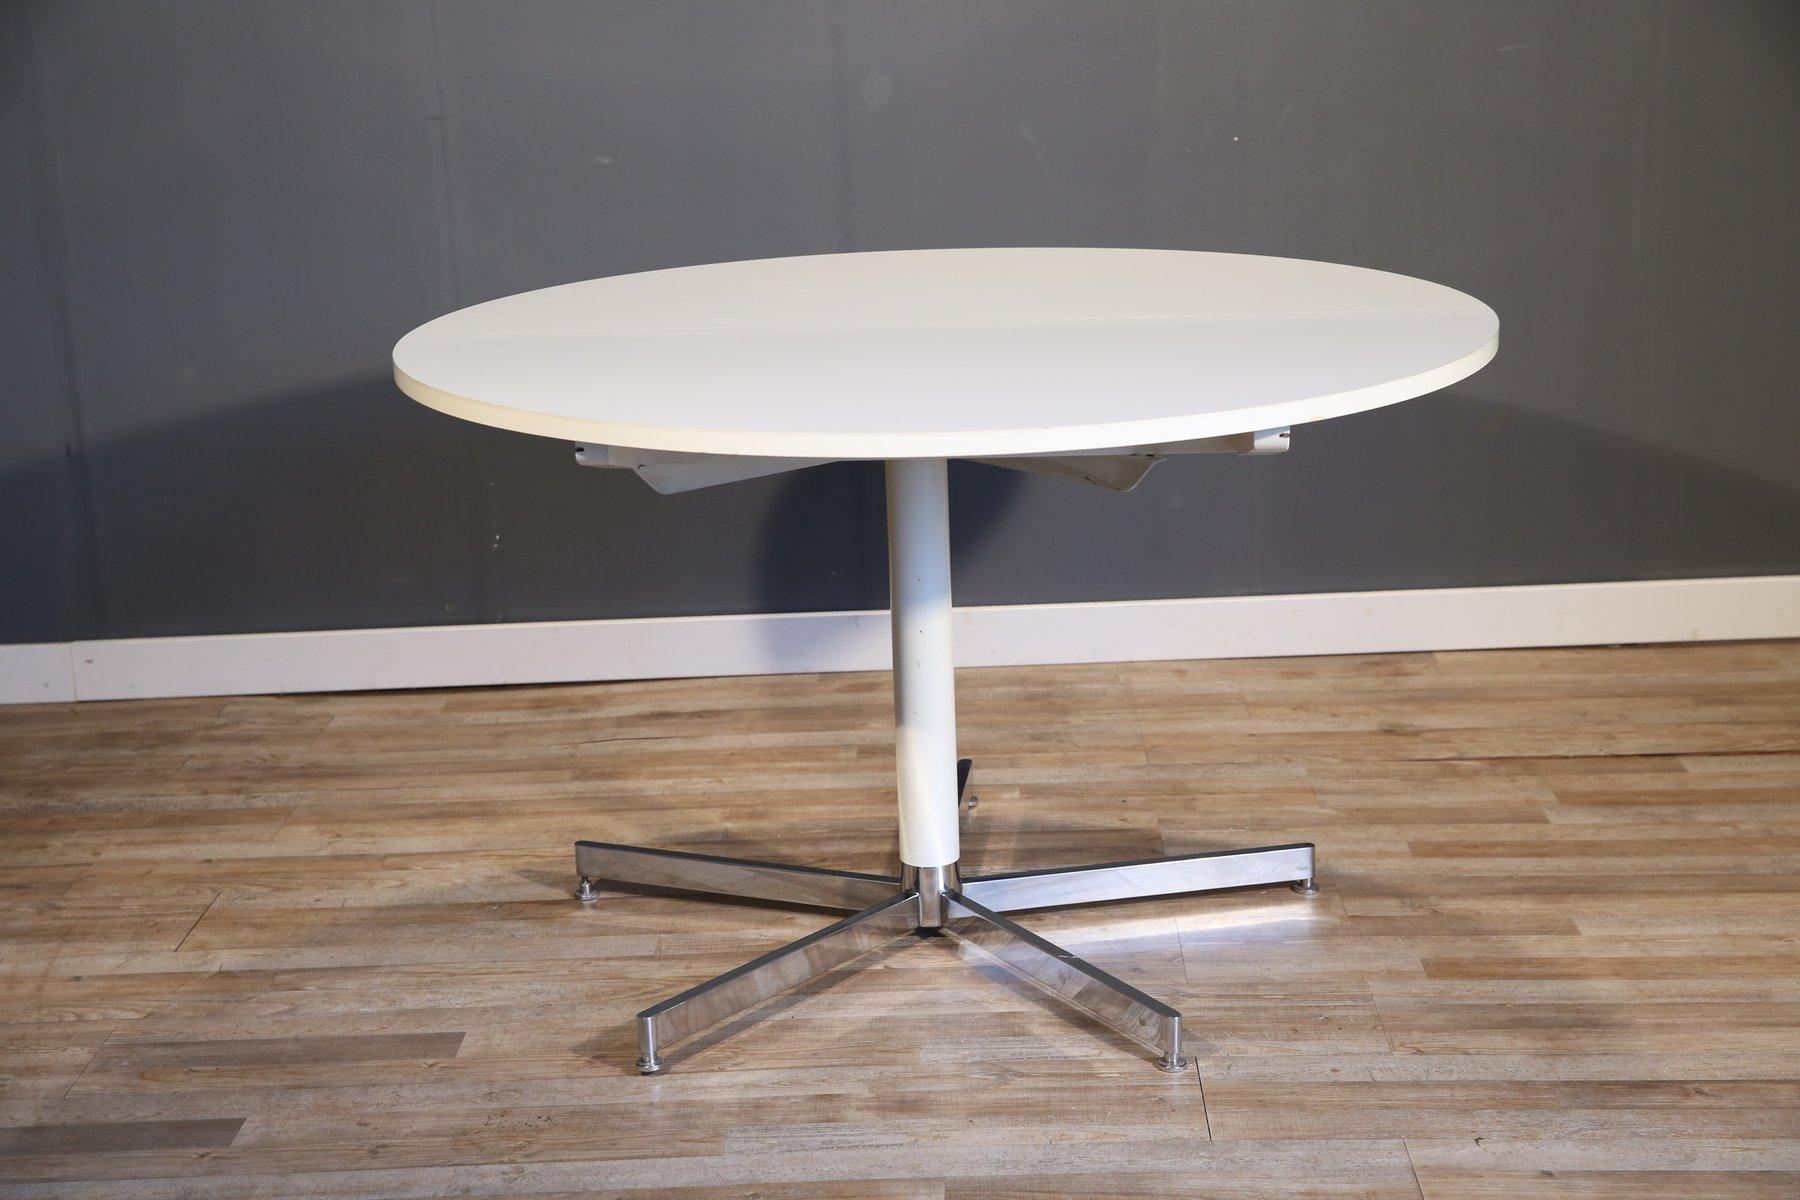 grande table de salle manger ronde blanche de tecta 1970s en vente sur pamono. Black Bedroom Furniture Sets. Home Design Ideas